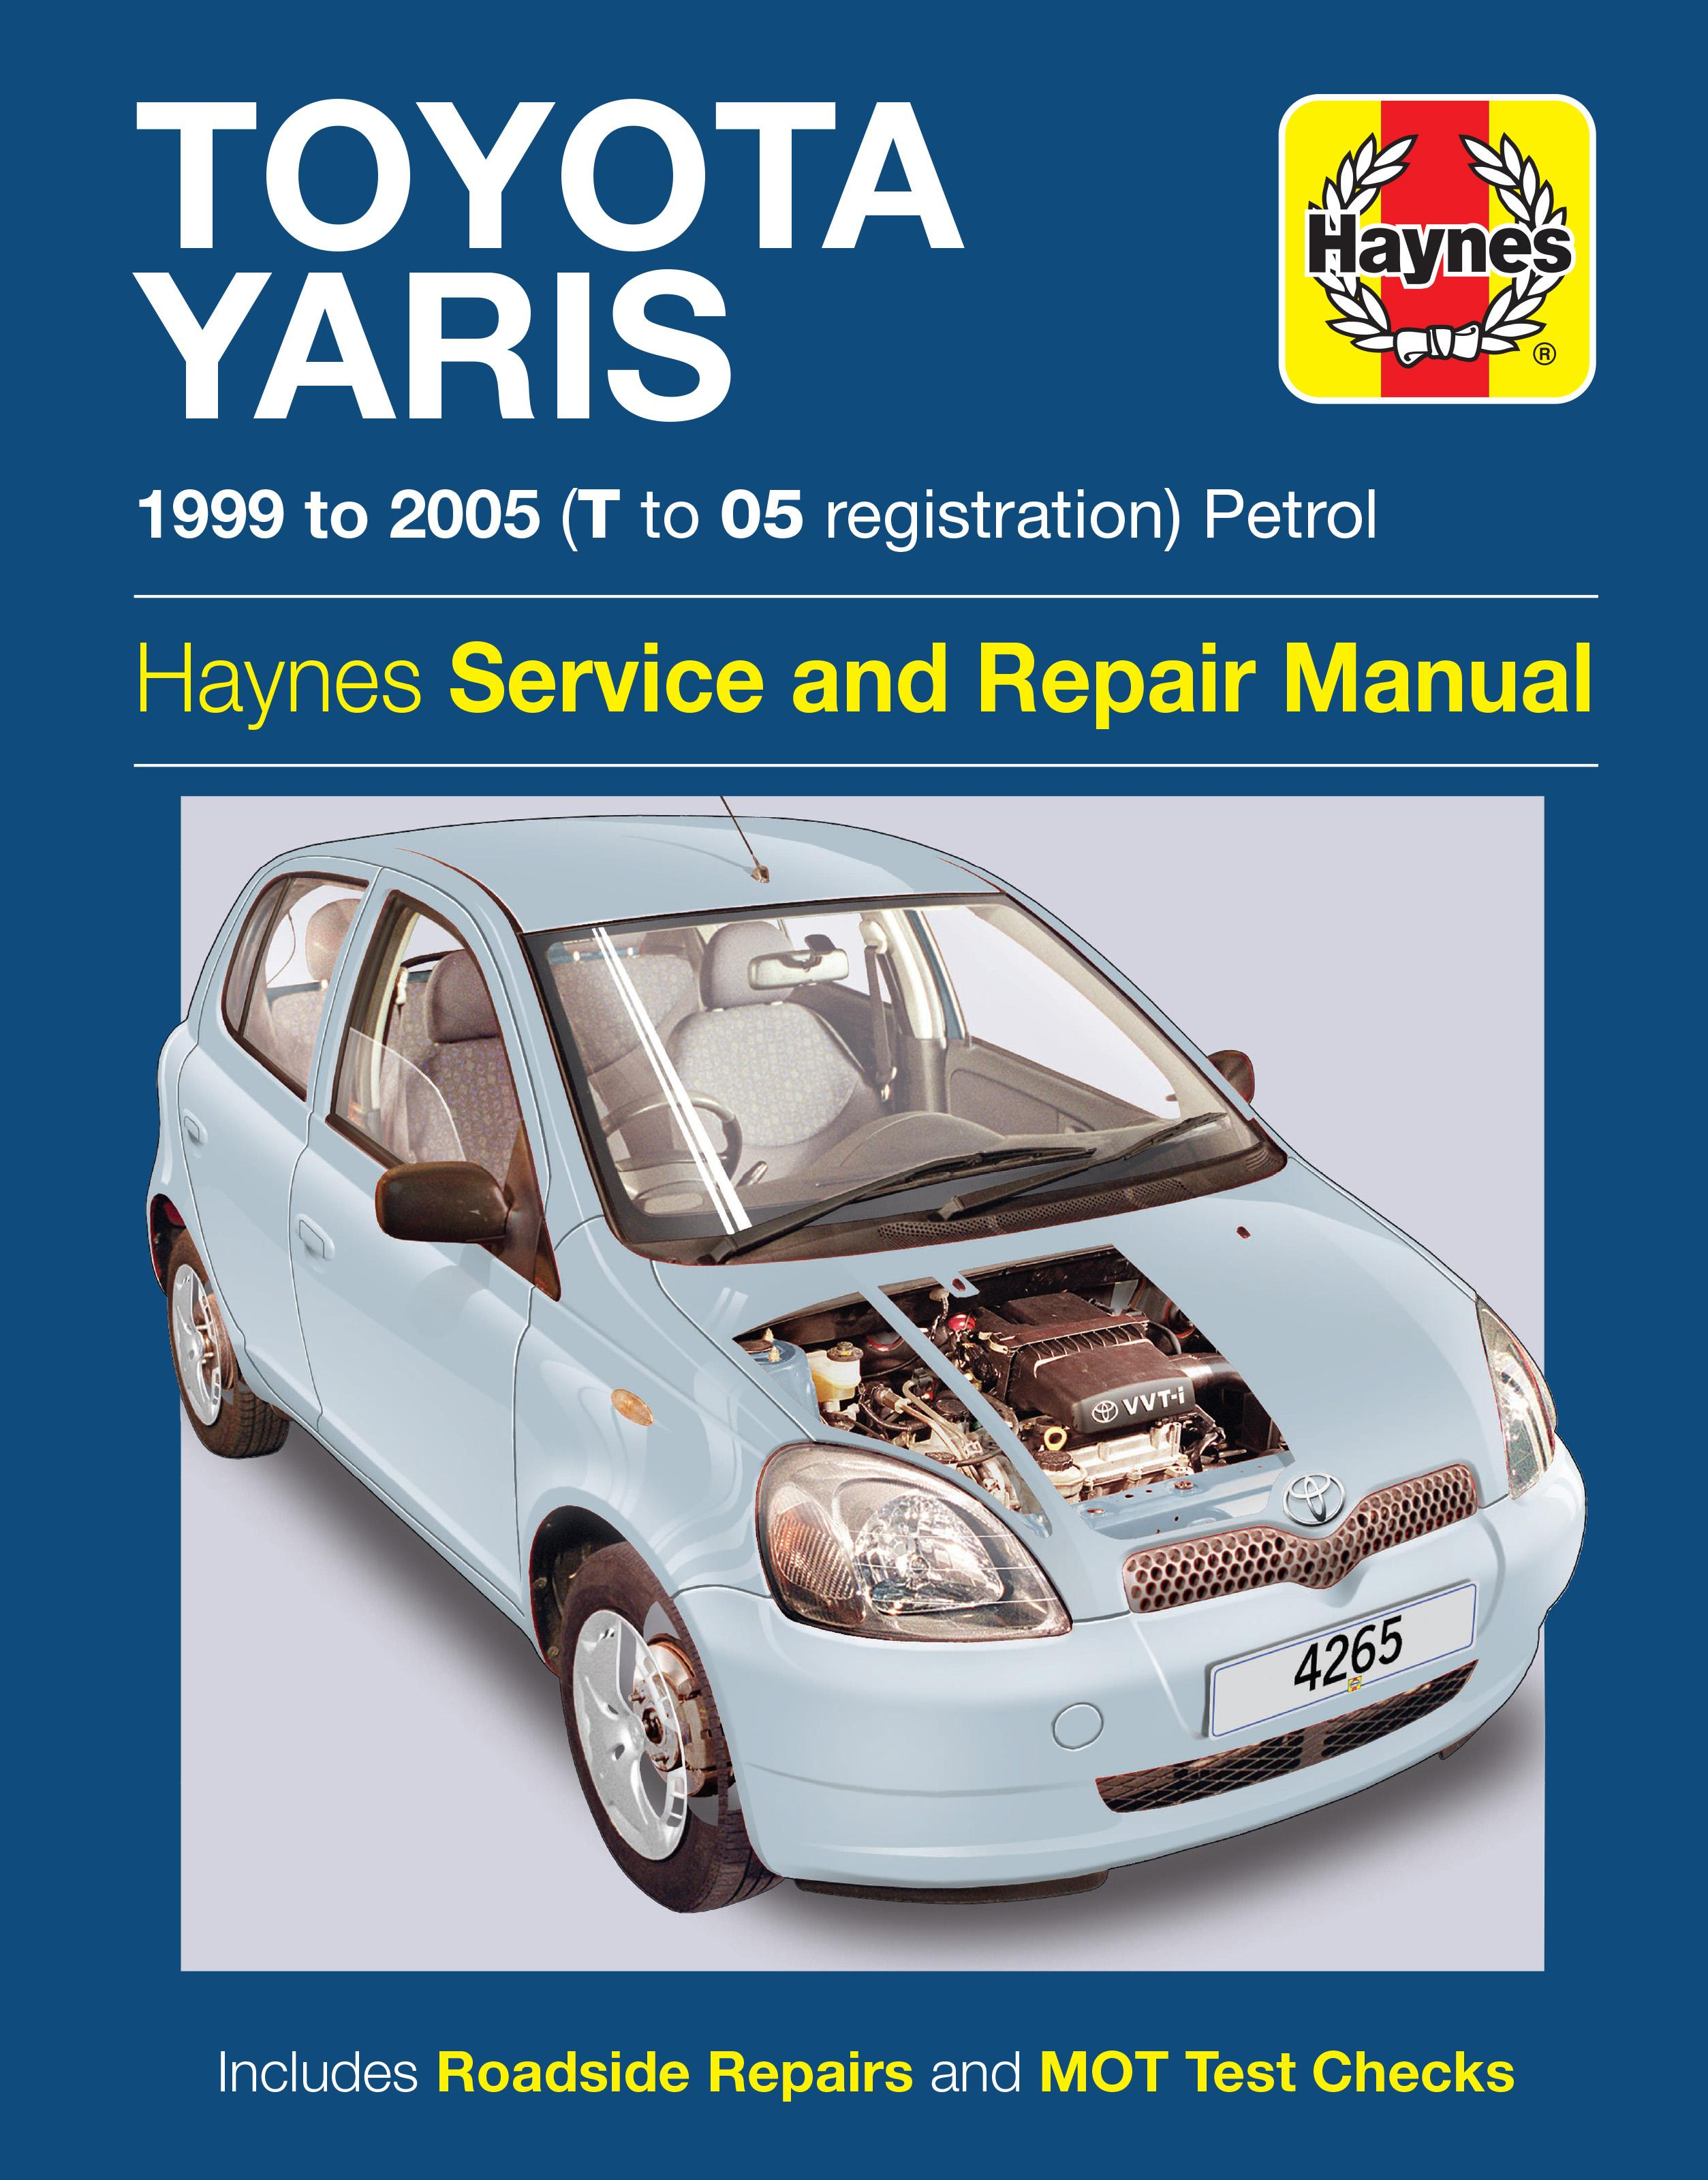 haynes toyota yaris 99 05 manua rh halfords com workshop manual toyota yaris diesel Toyota Yaris Repair Manual PDF